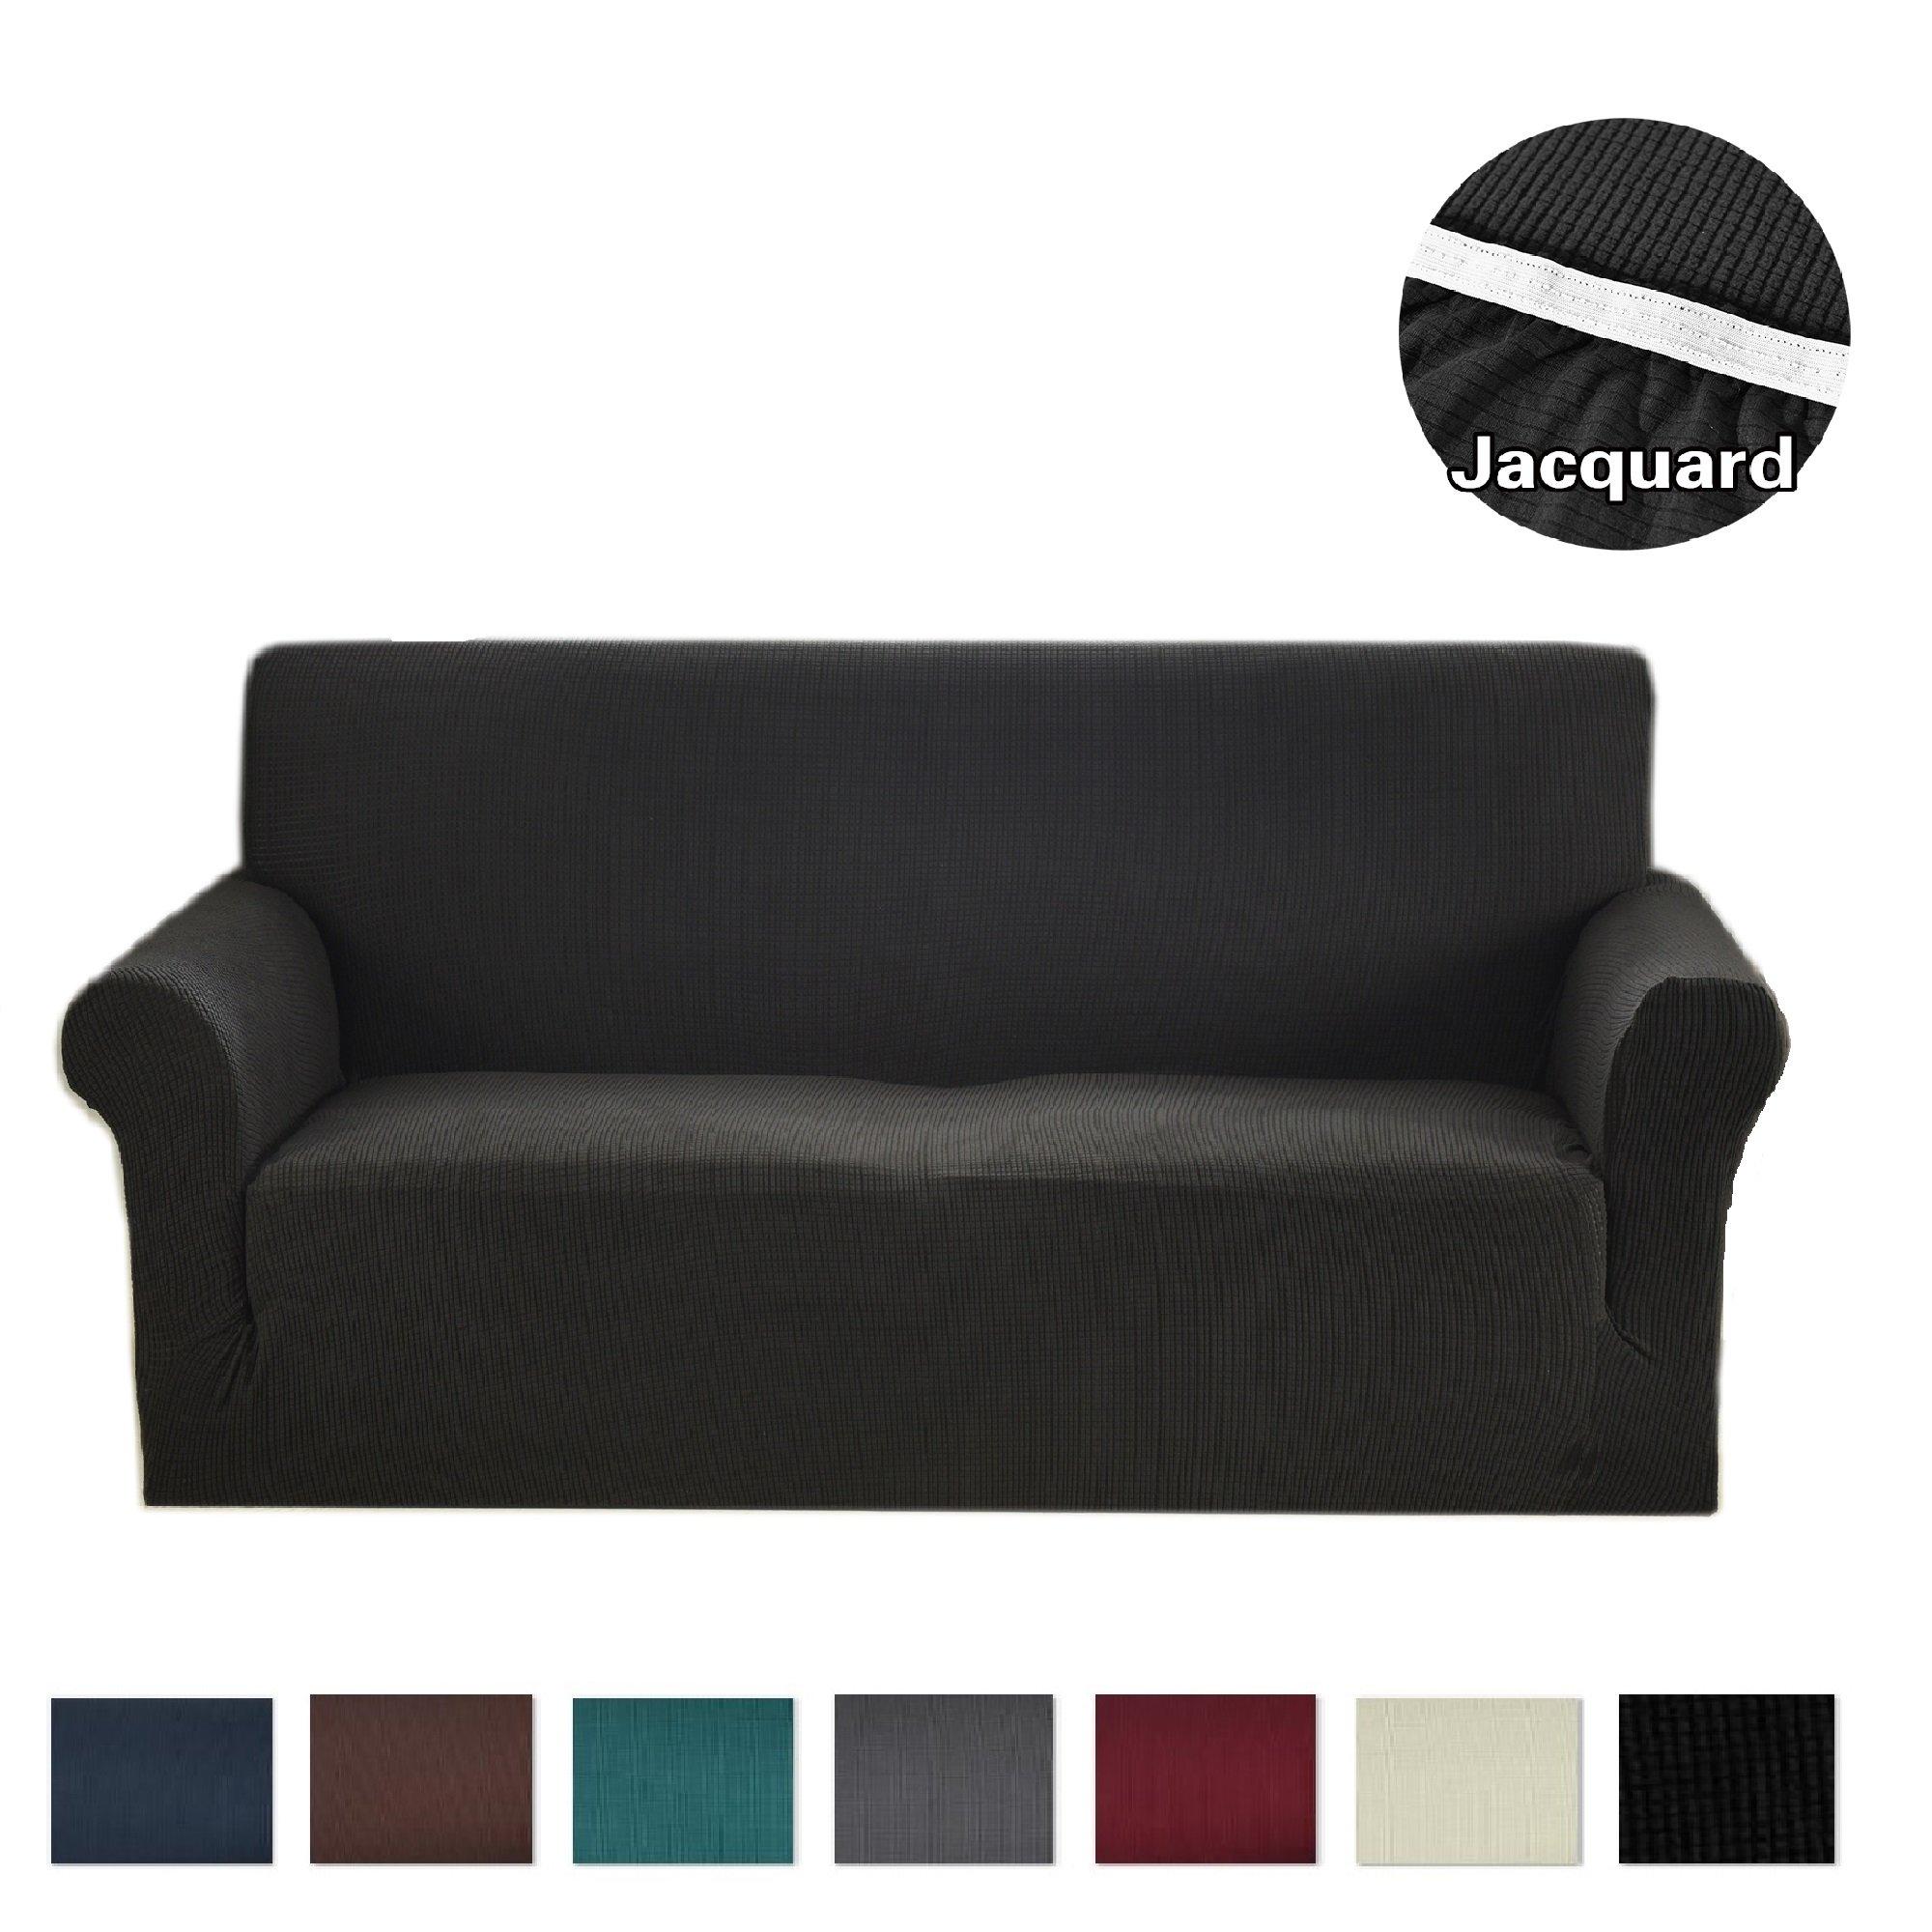 Argstar Jacquard Sofa Slipcover (Extra Large) Black